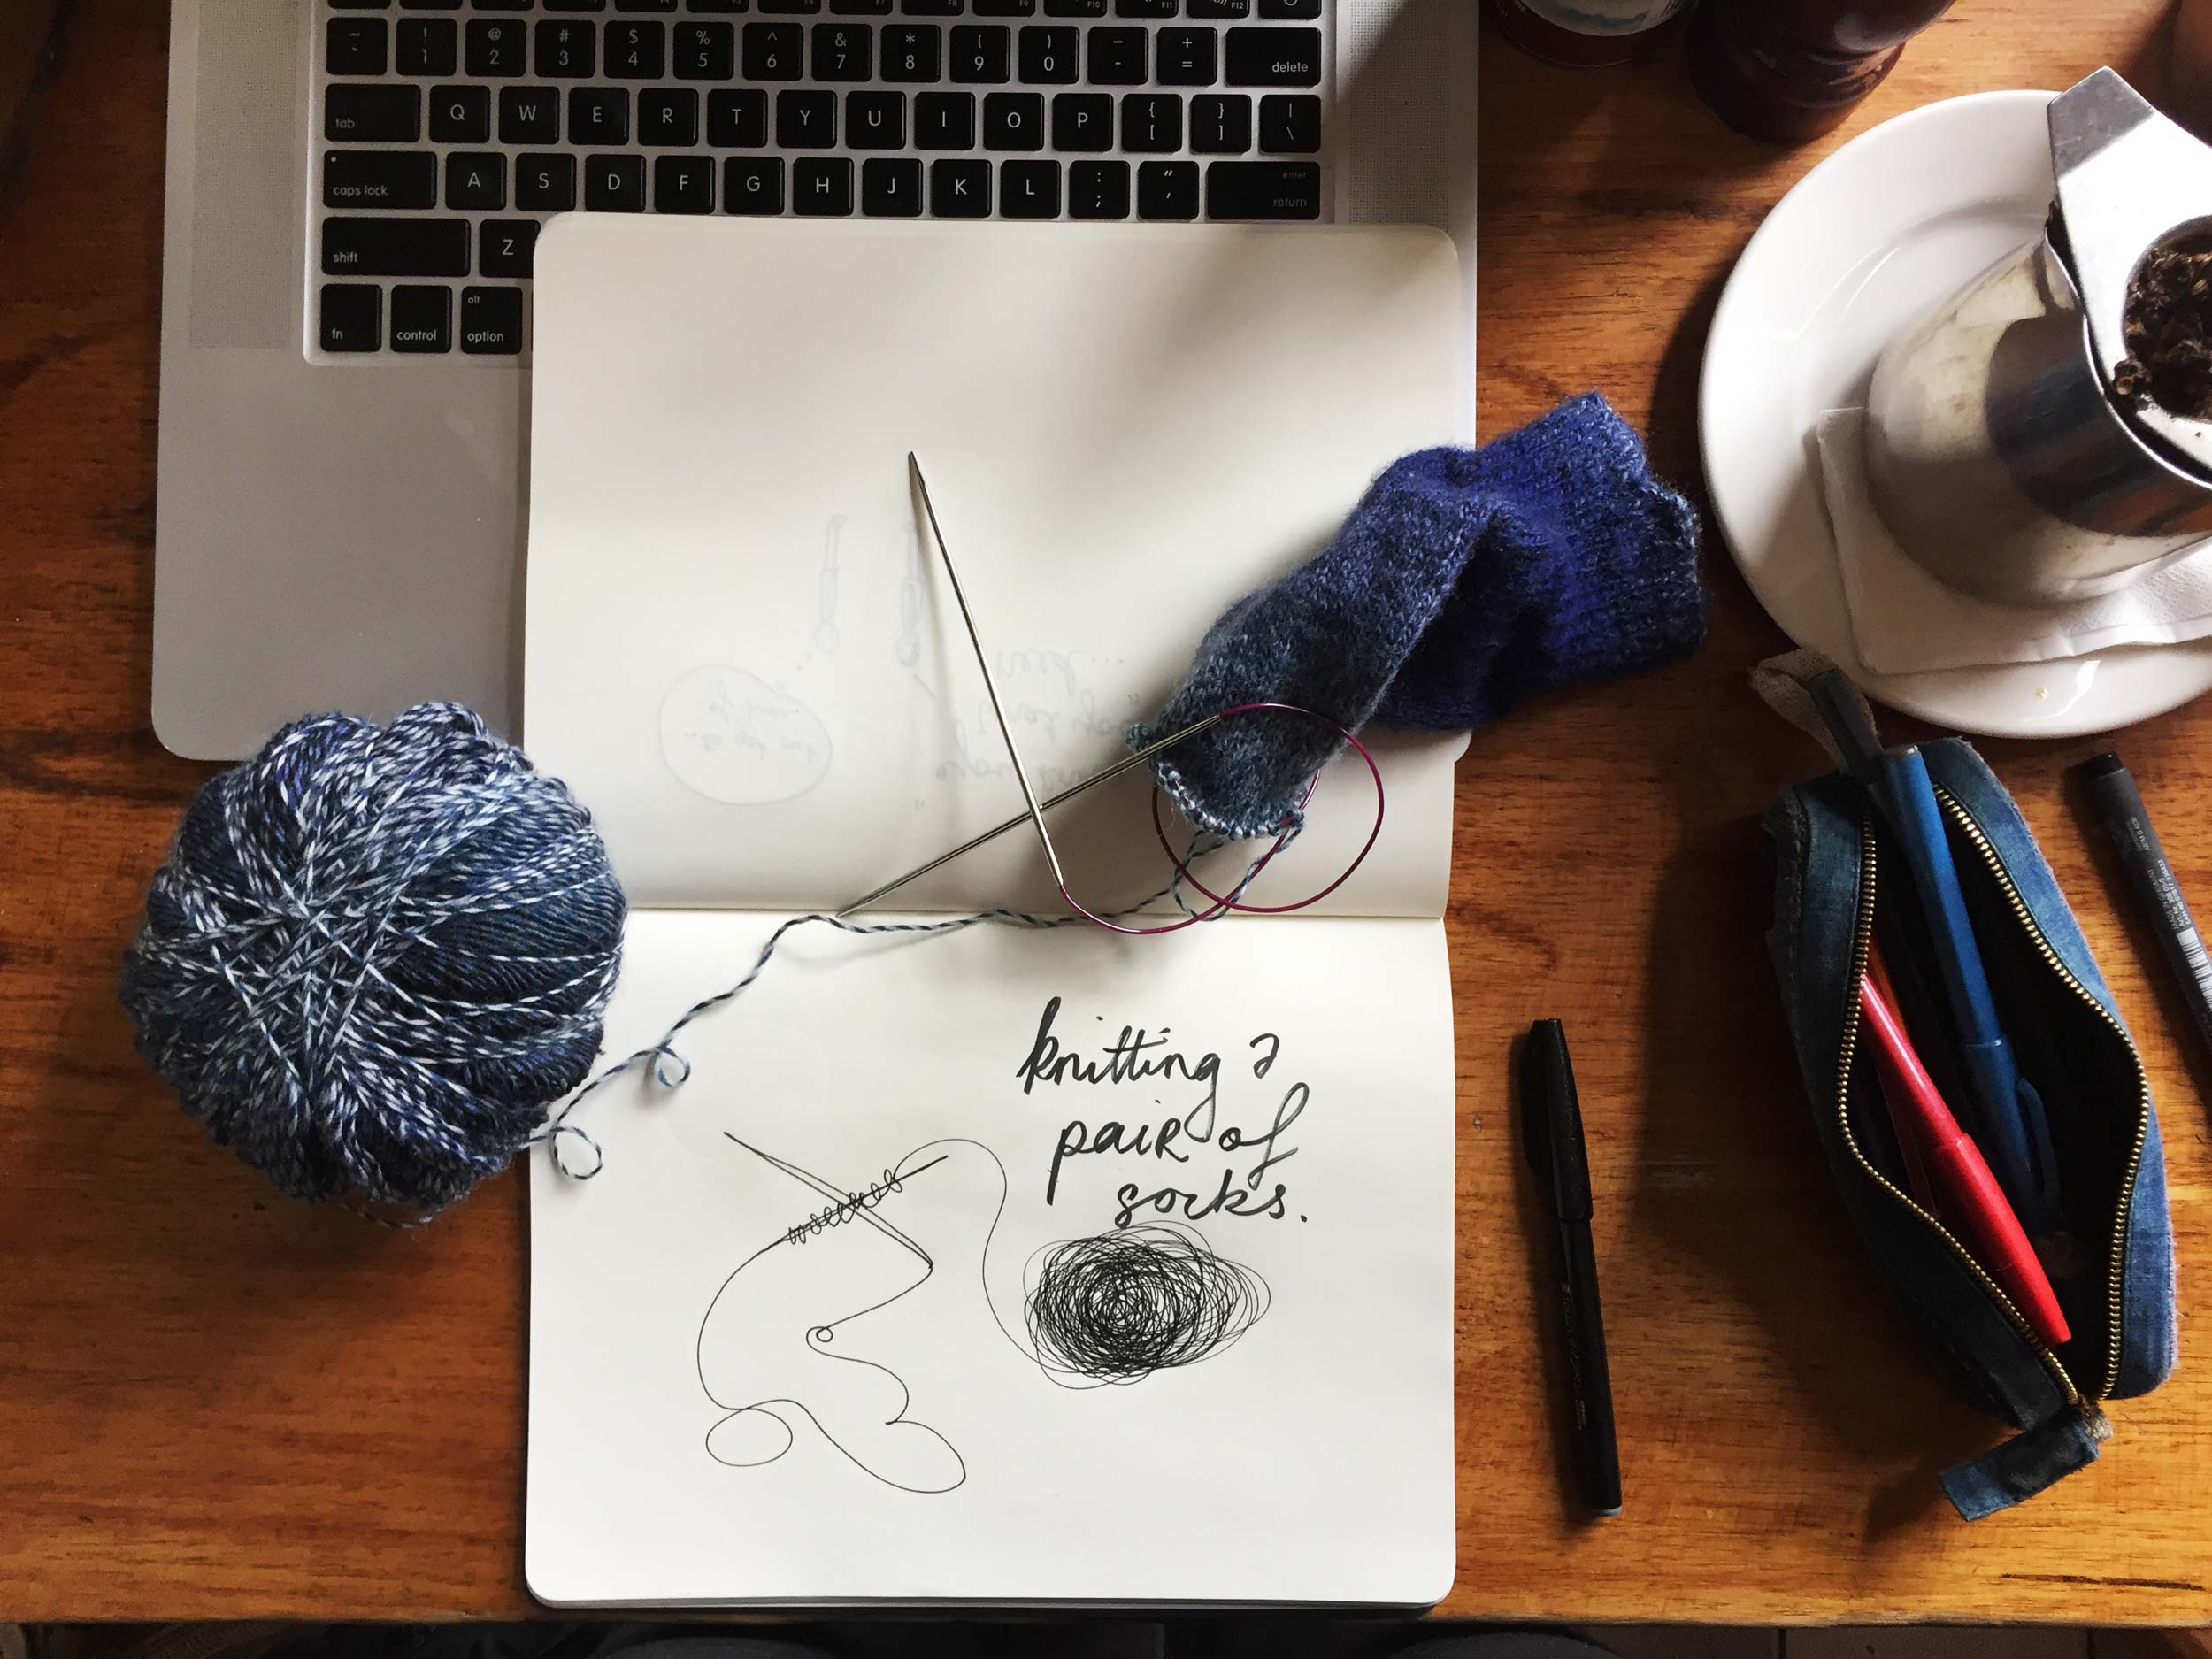 Knitting a pair of socks. Drawing Luke Hockley.